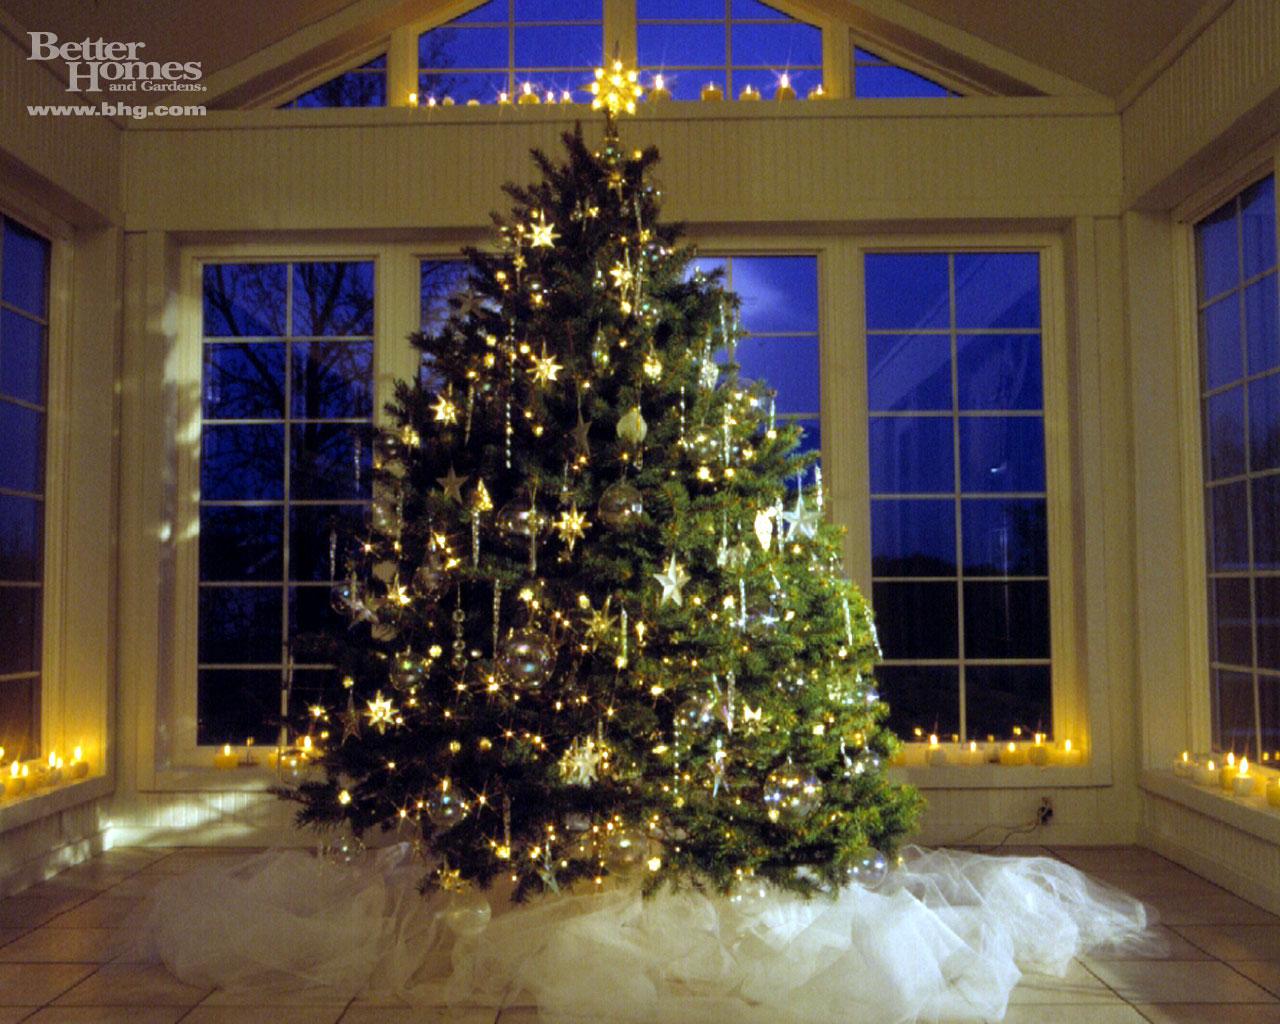 All Stuff 4 U: Christmas Tree Greeting Cards